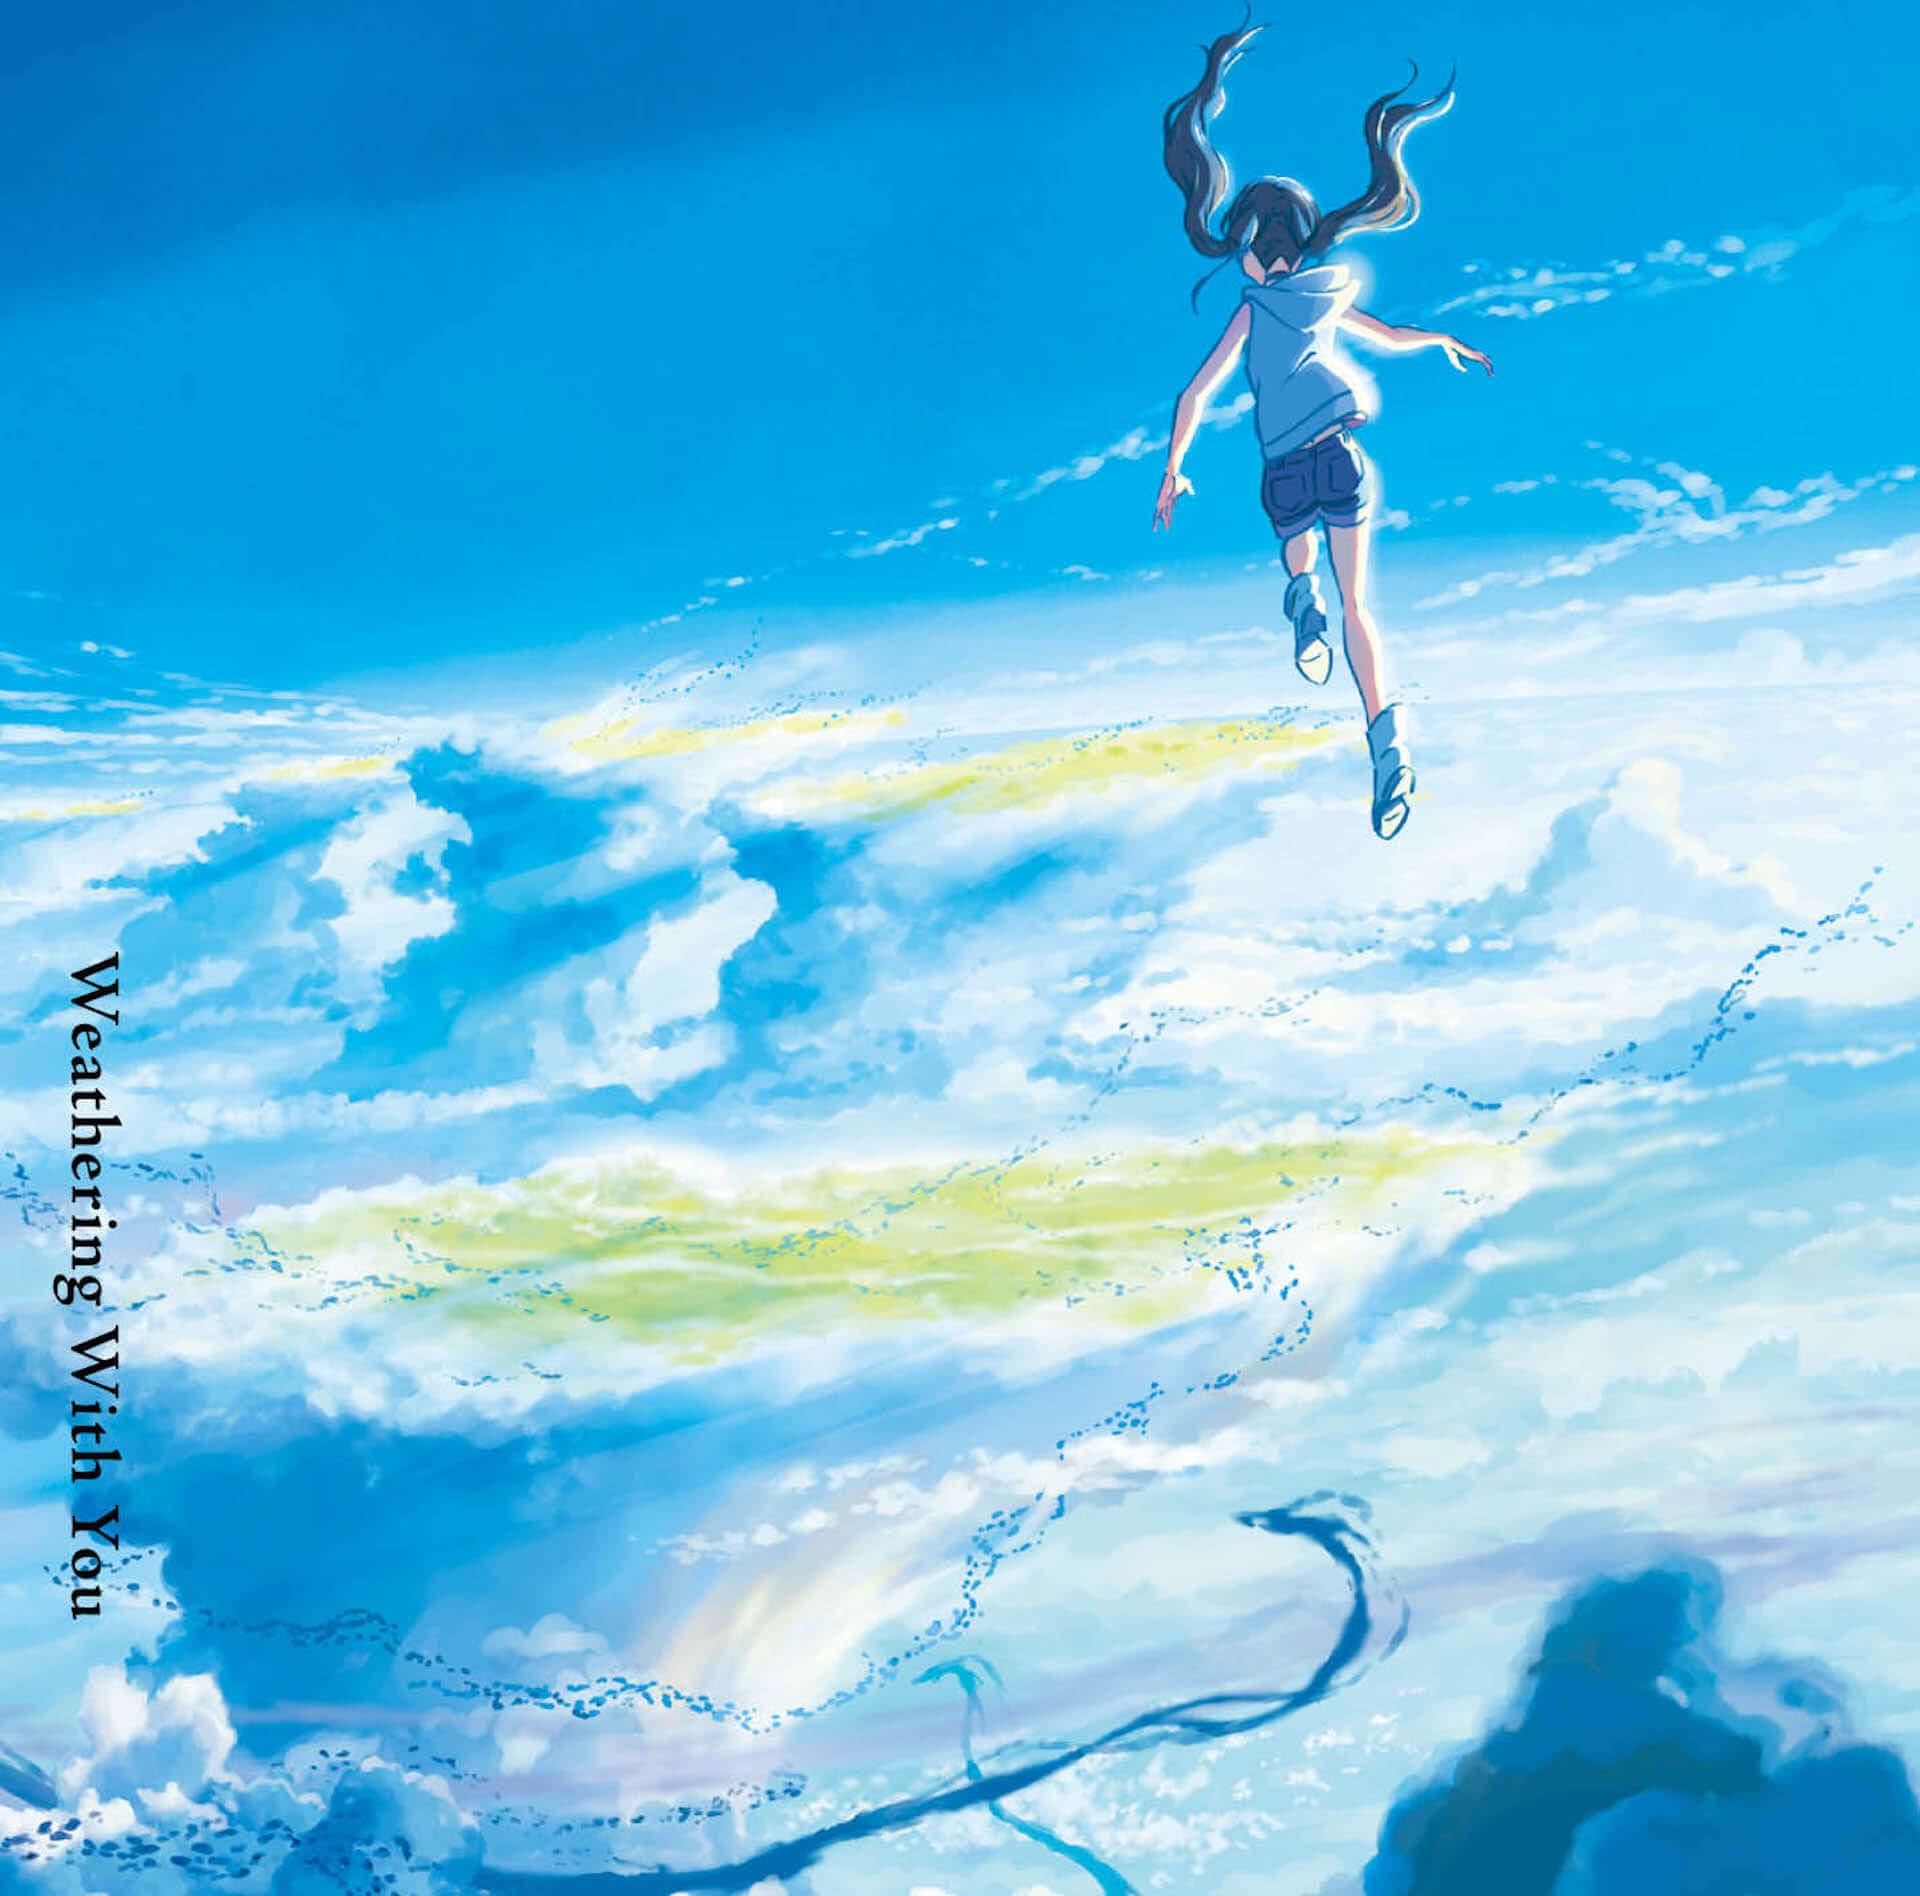 RADWIMPSアルバム『天気の子』が本日発売!「愛にできることはまだあるかい」MVも公開 music190719_radwimps_tenkinoko_main-1920x1896